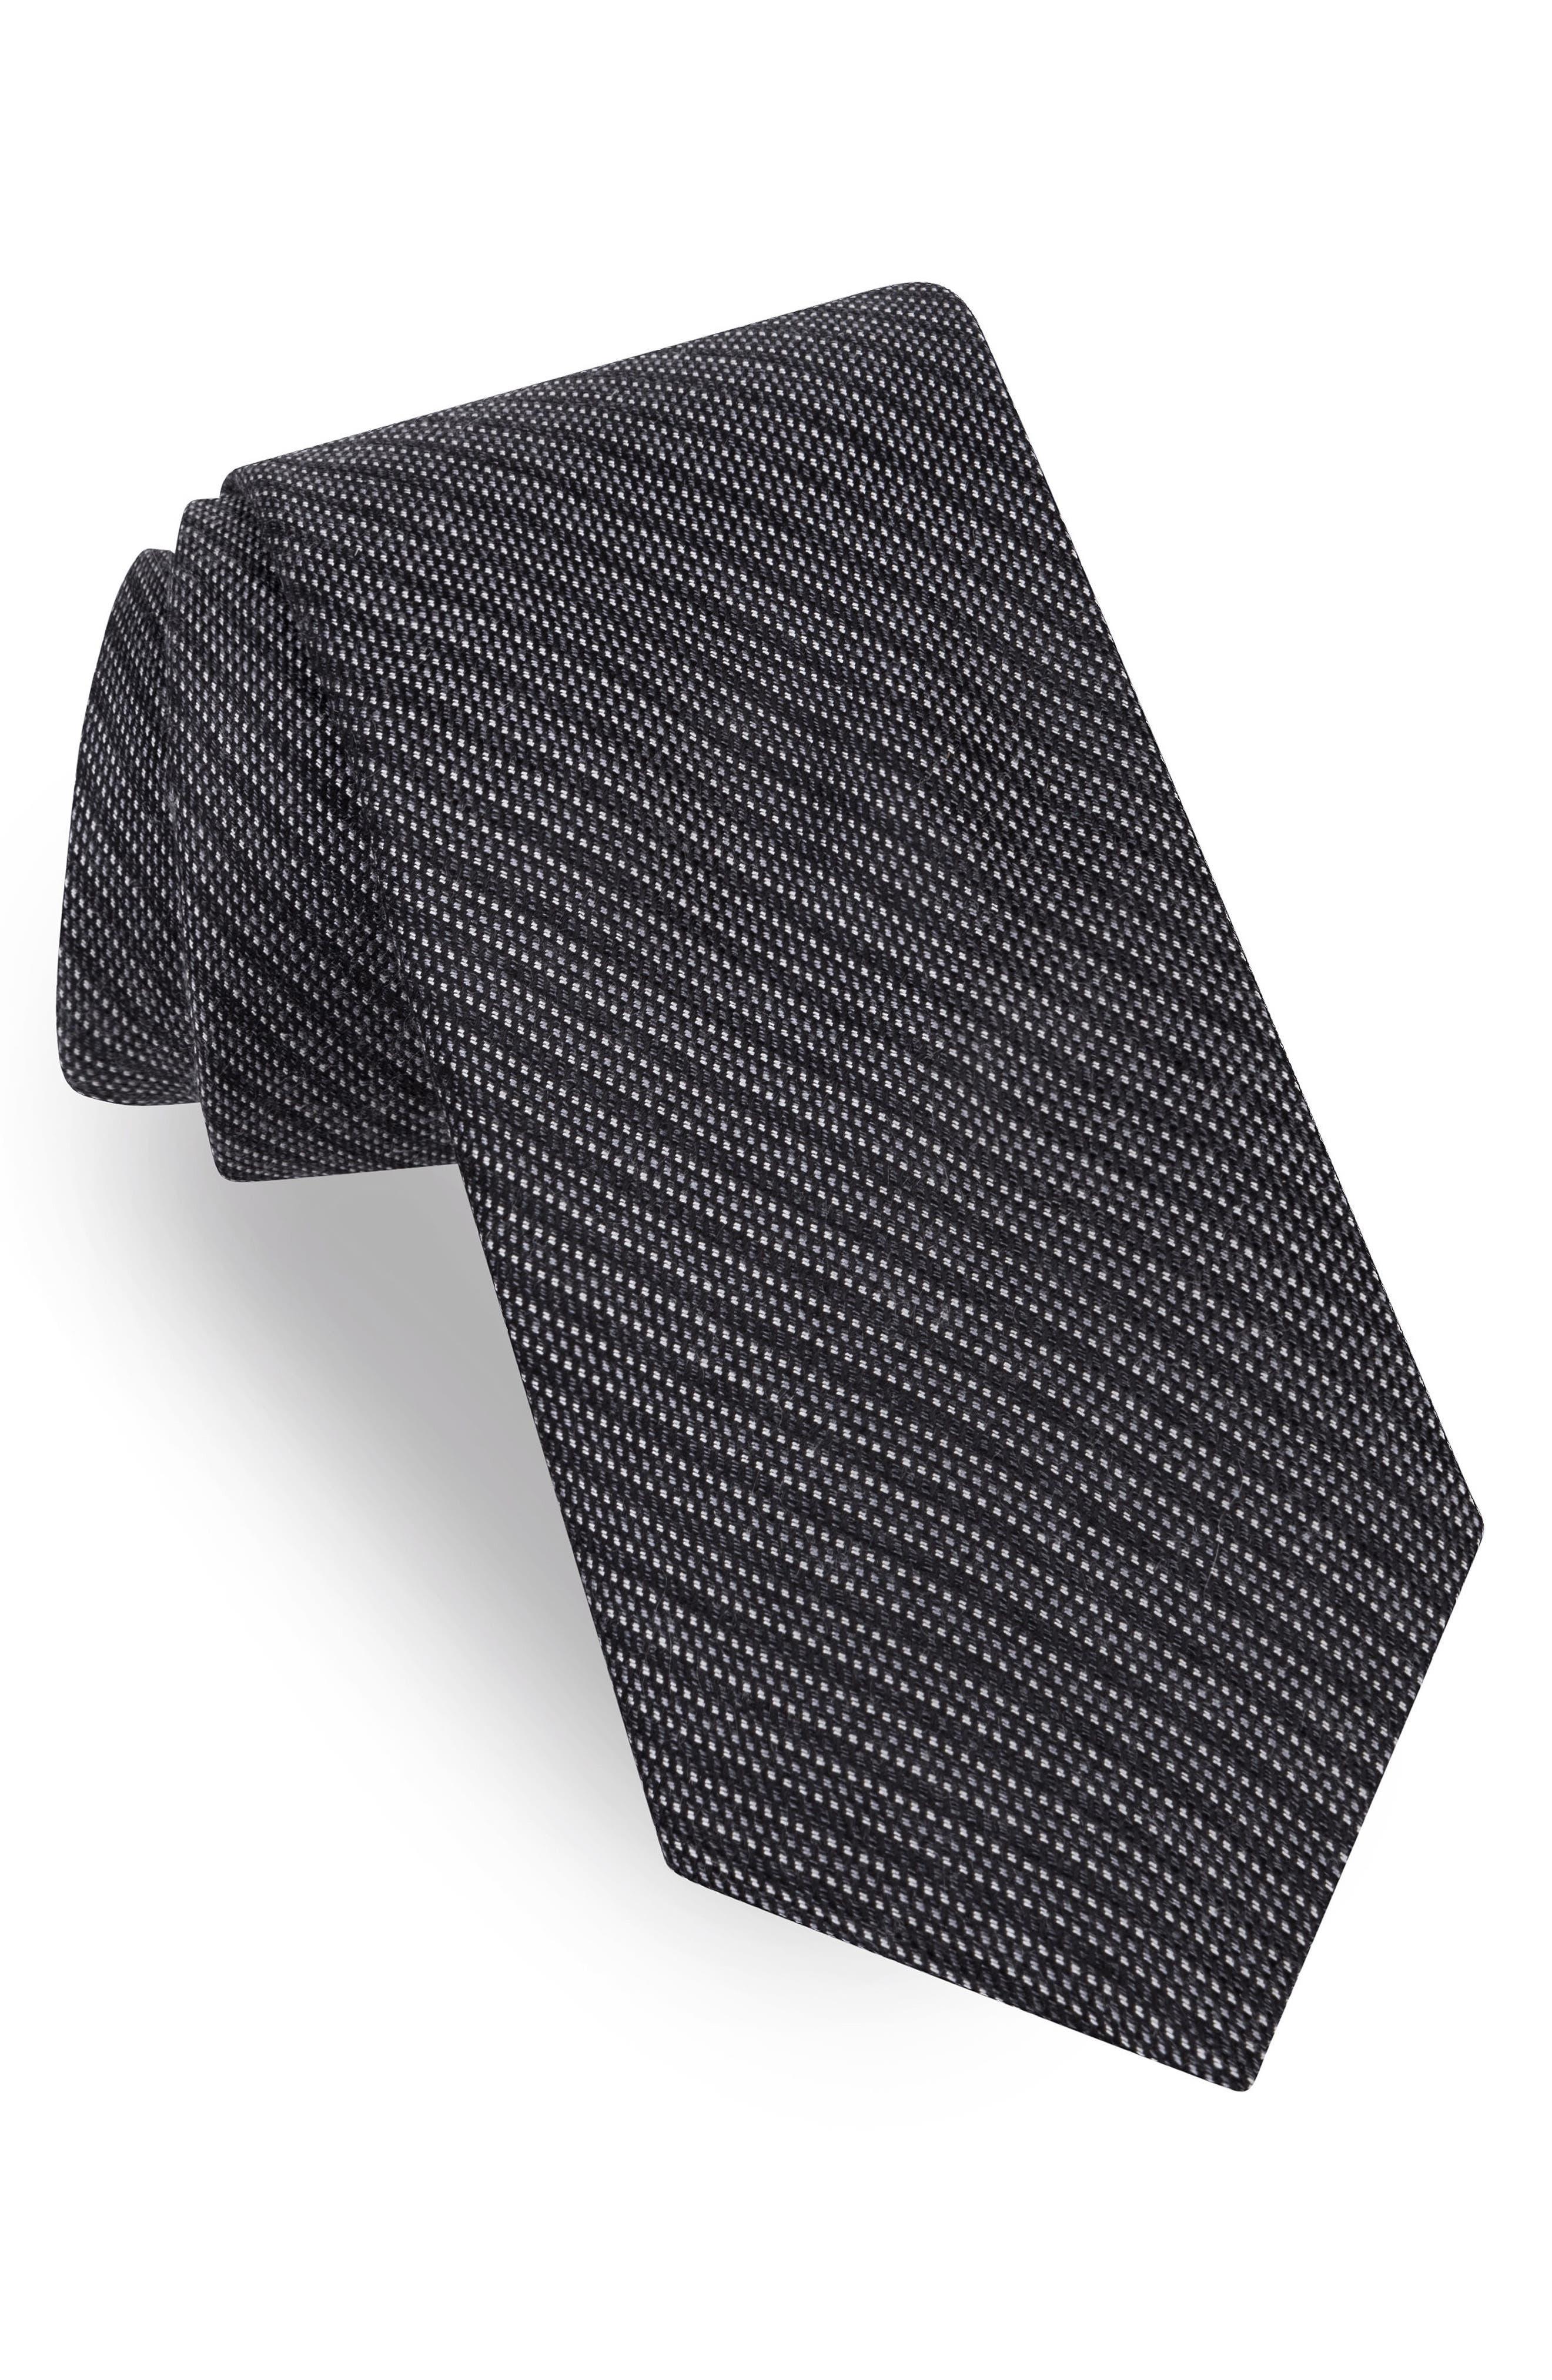 Main Image - Ted Baker London West End Wardrobe Silk Tie